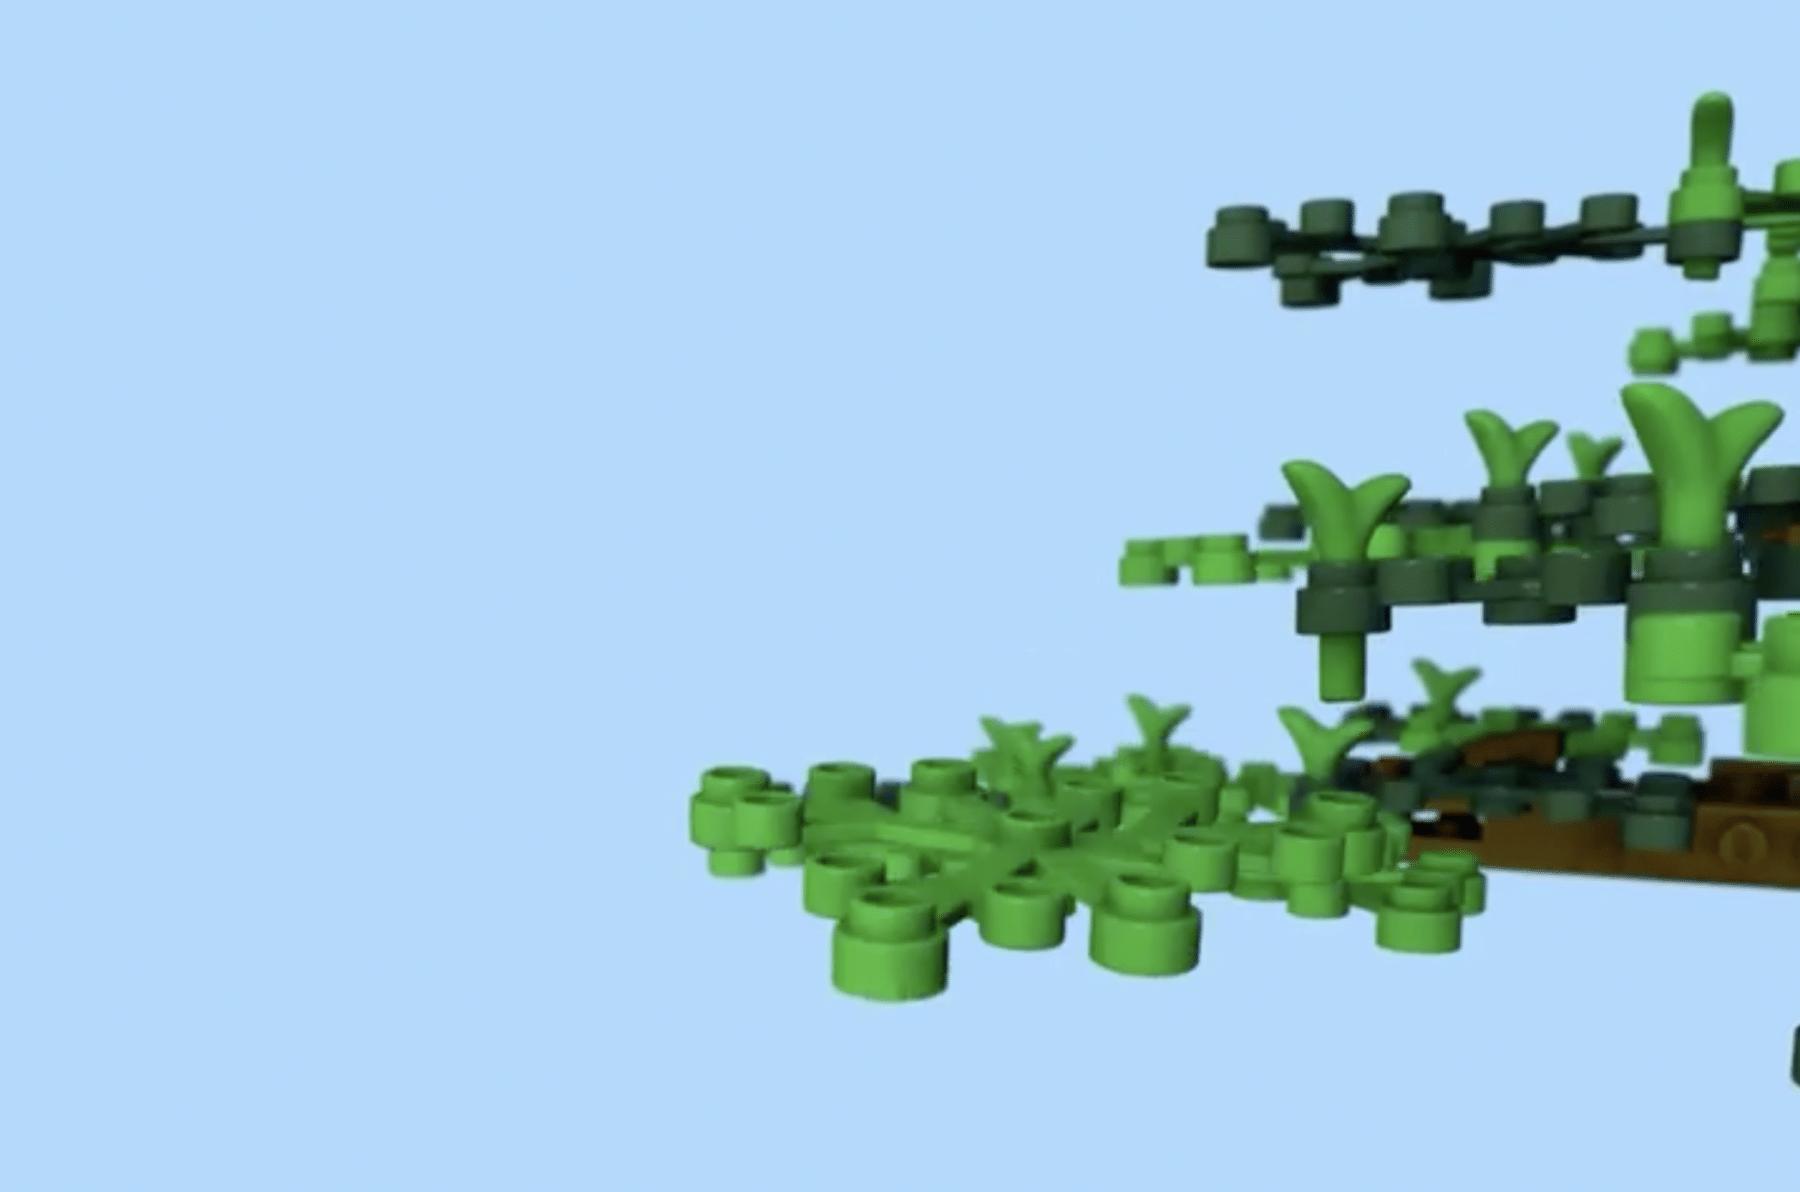 LEGO 21318 Baumhaus Teaser